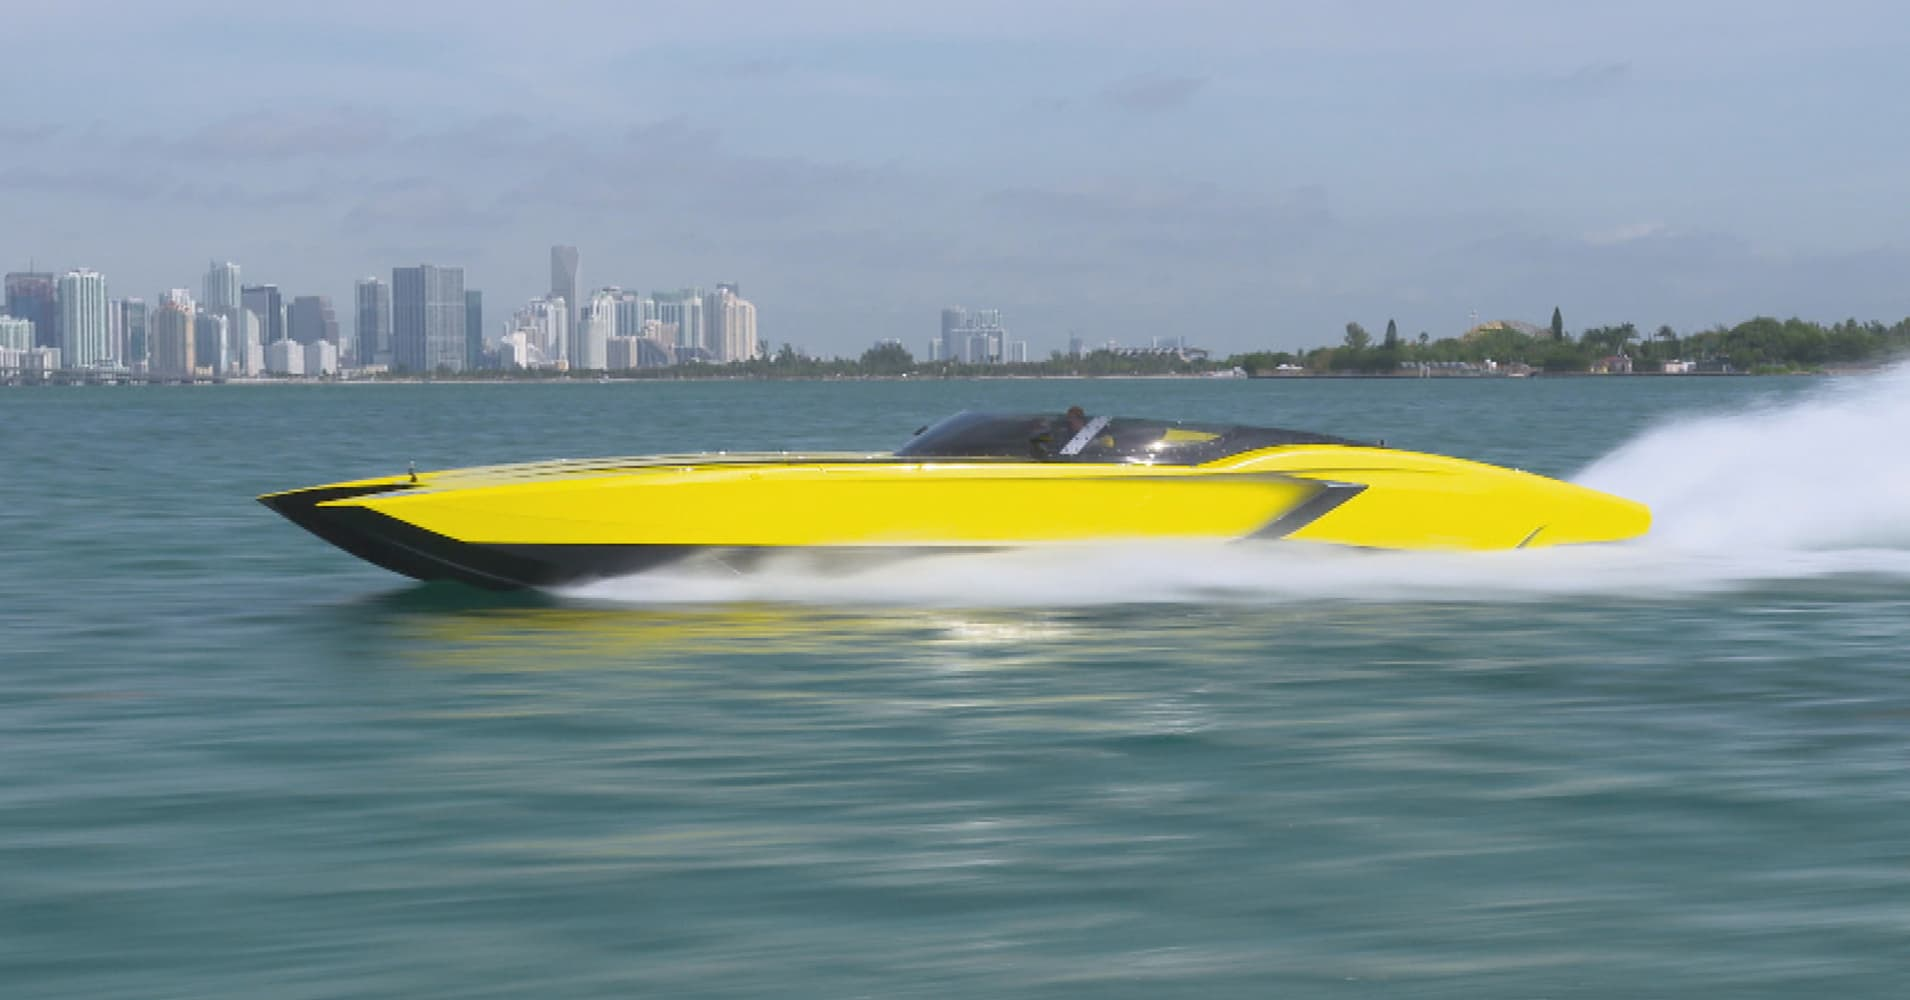 Lambo vs \u0027Lamboat\u0027 Pitting supercar vs superboat